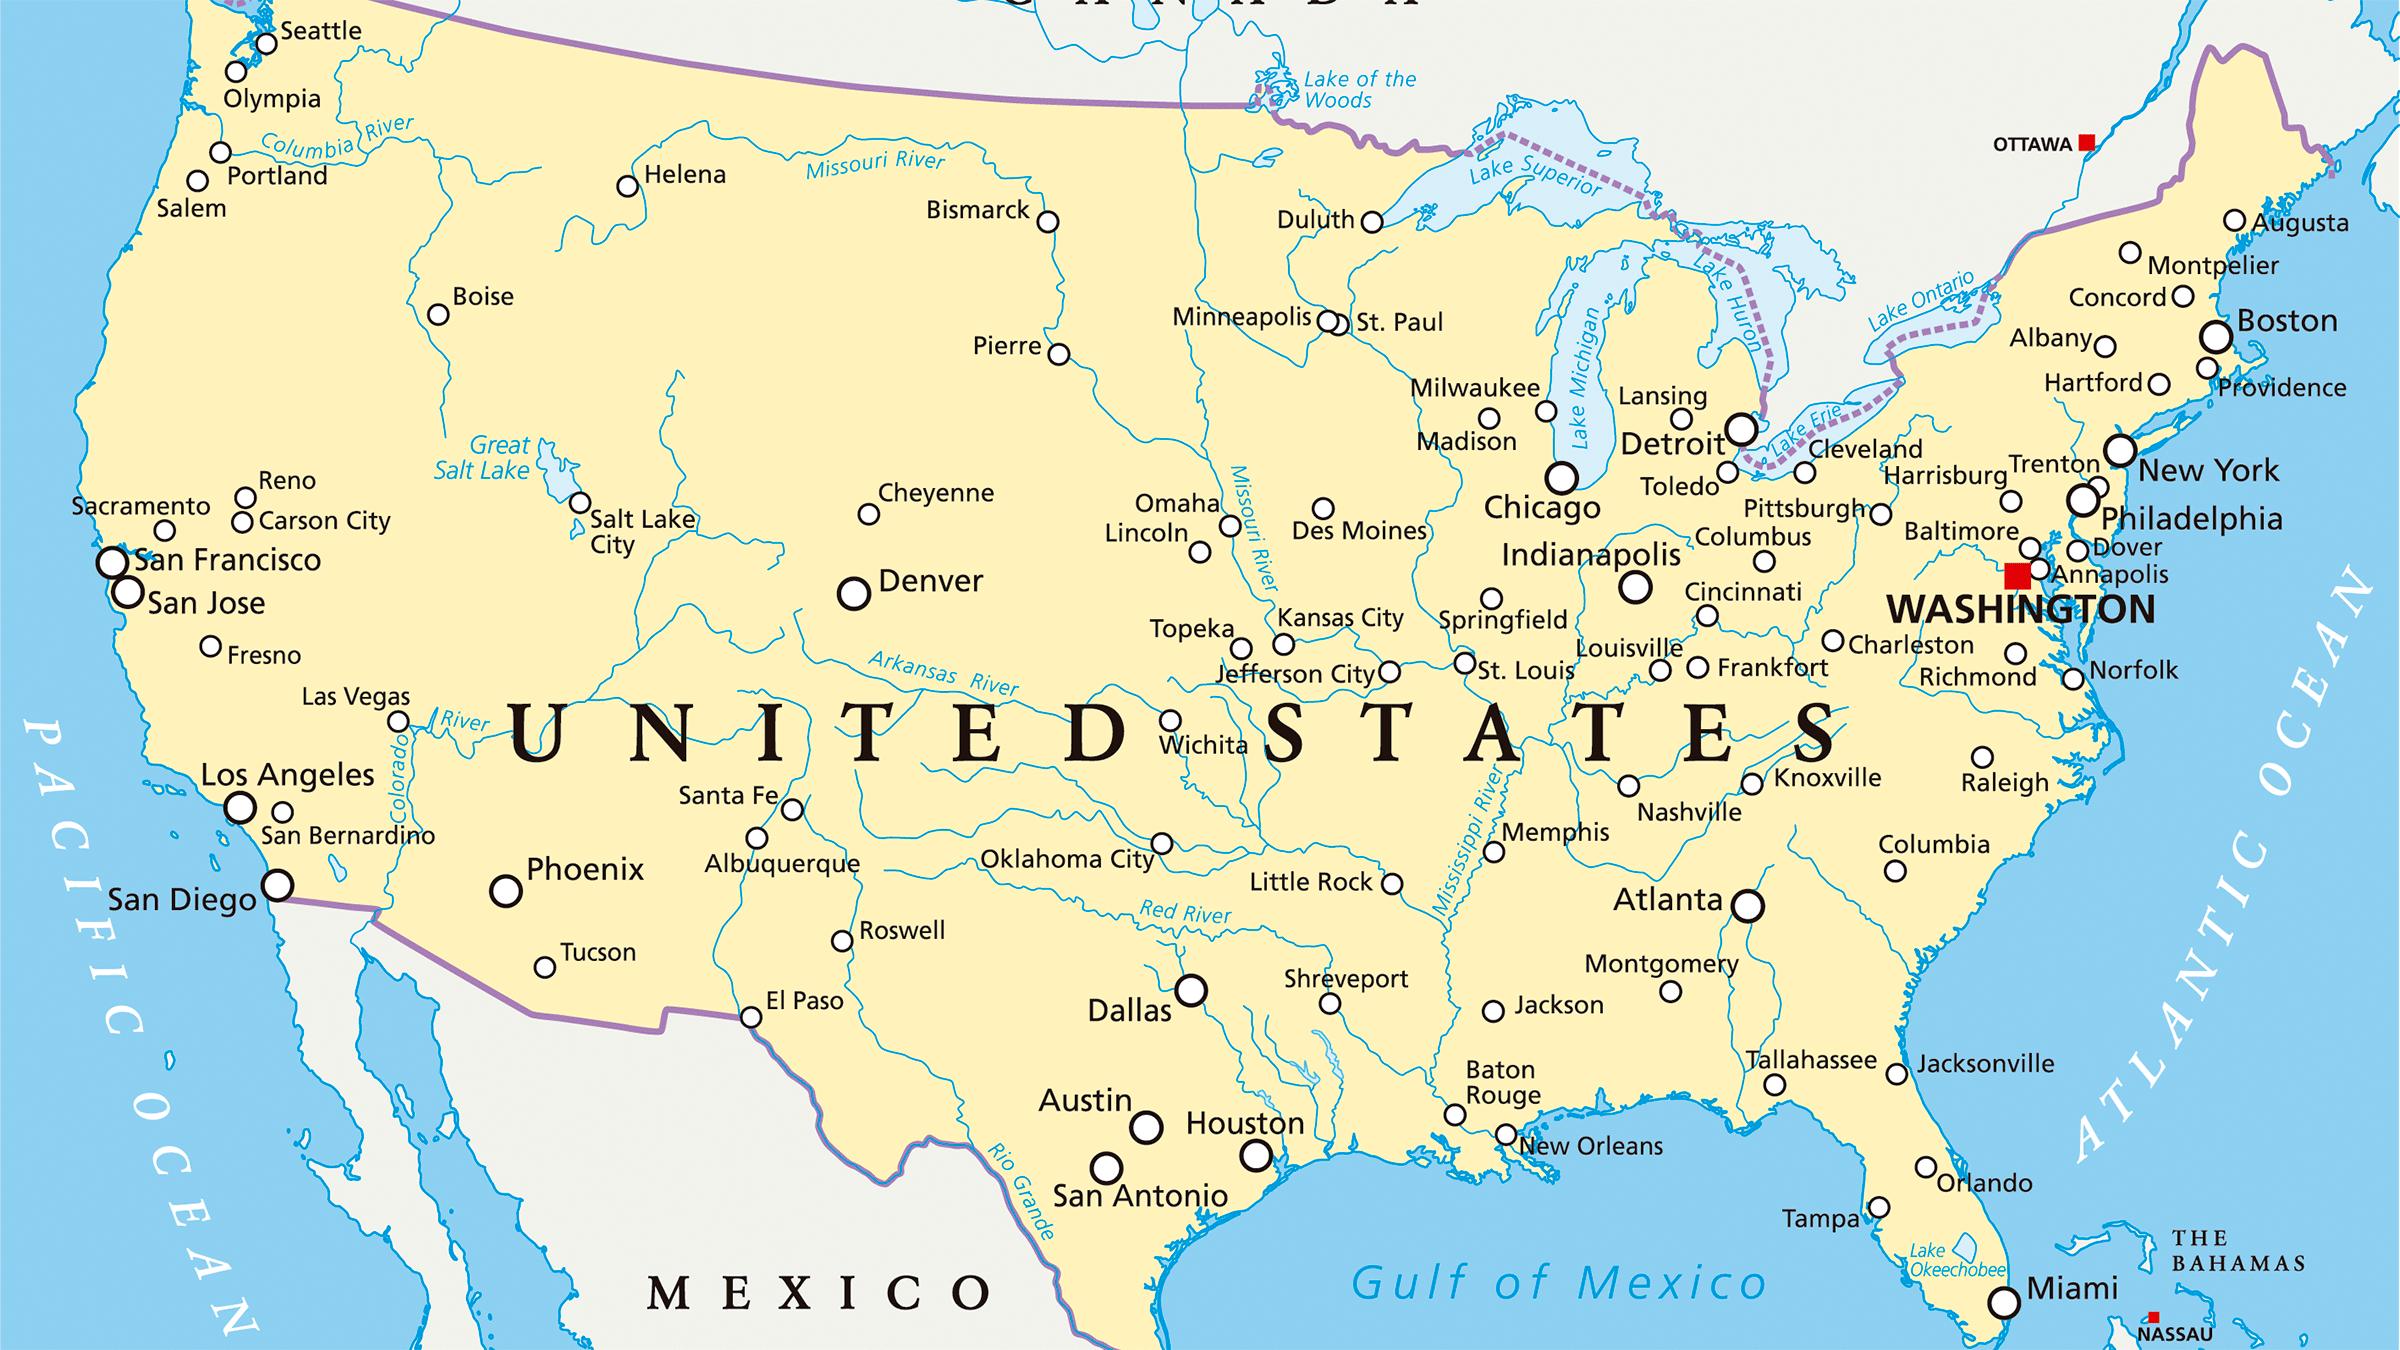 Mapa Hidrográfico De Estados Unidos Mapas Del Mundo Pinterest - Mapa de usa